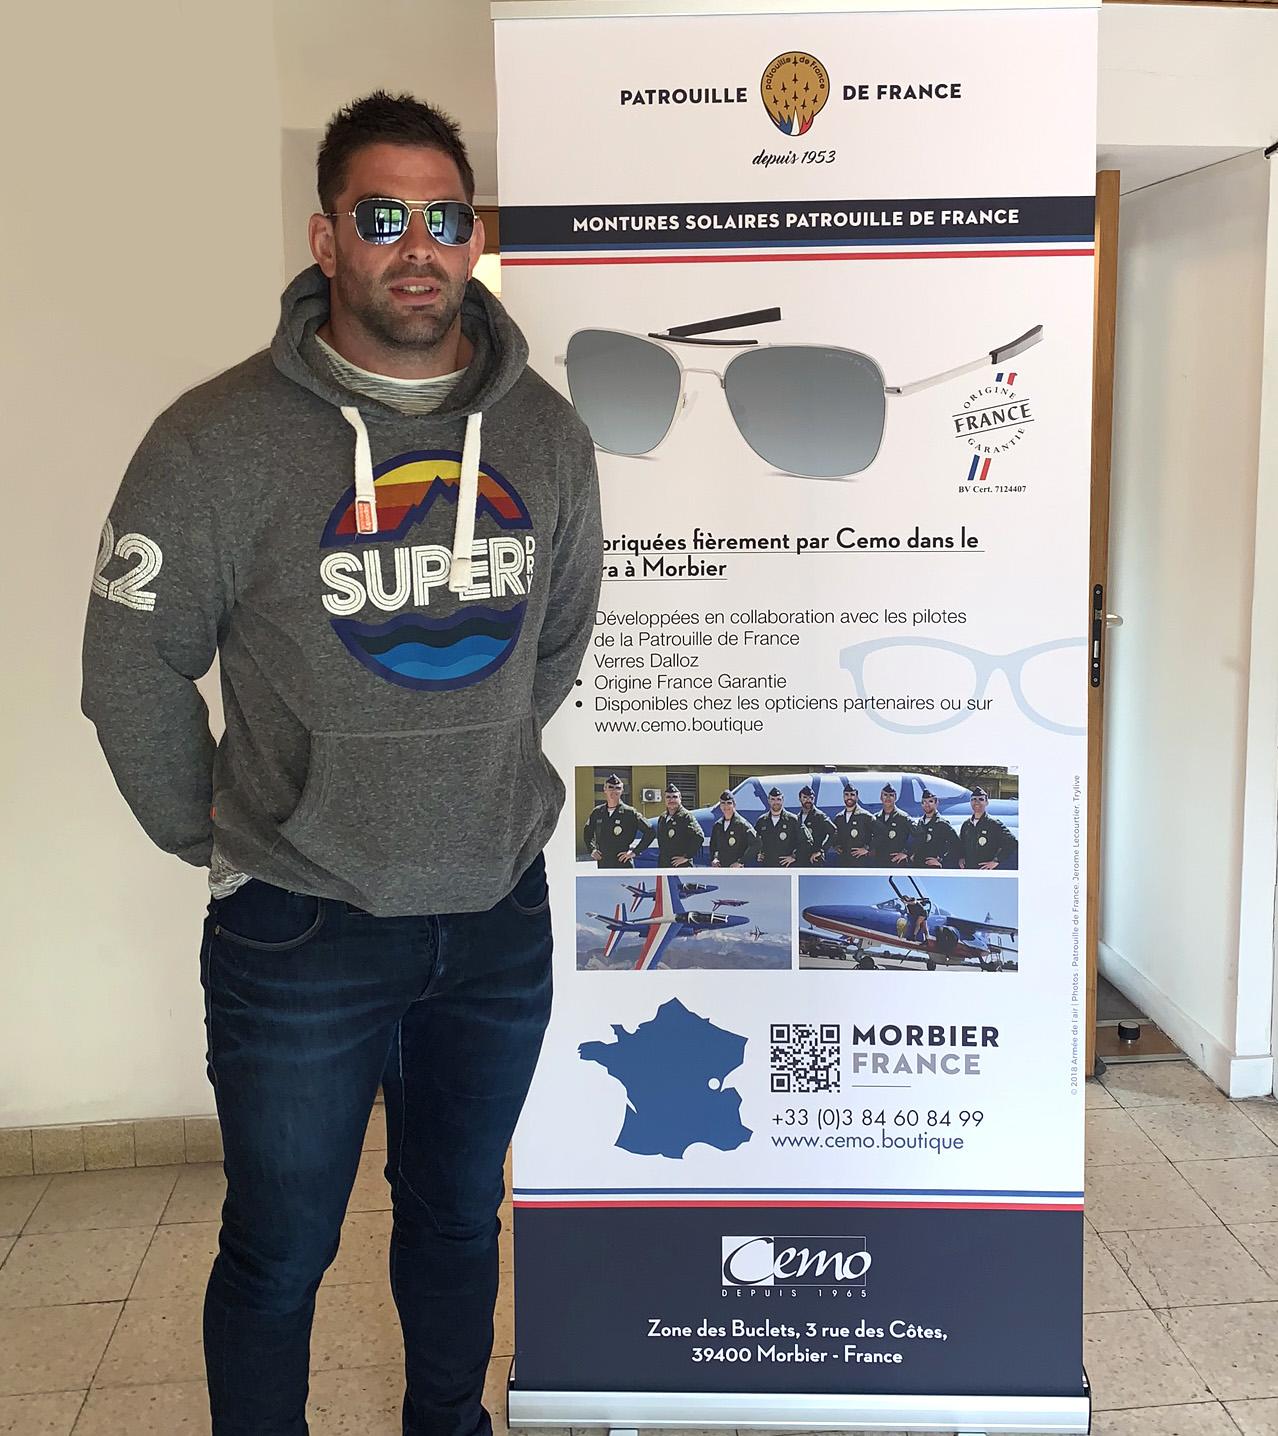 Benjamin Geledan Oyonnax Rugby Lunettes Patrouille de France CEMO